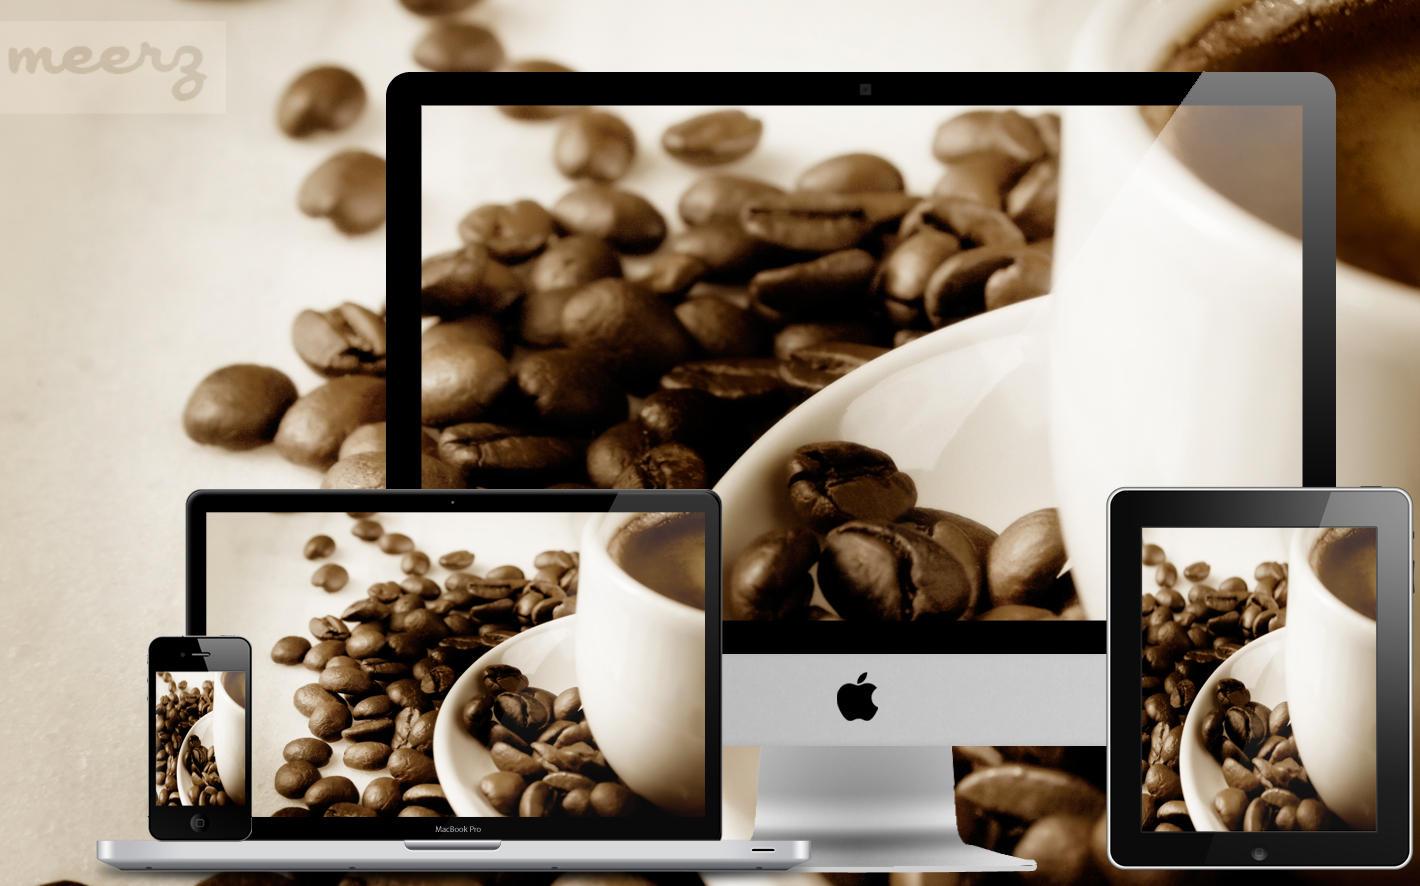 Wallpaper 15 - Morning Coffee by xmeerzx